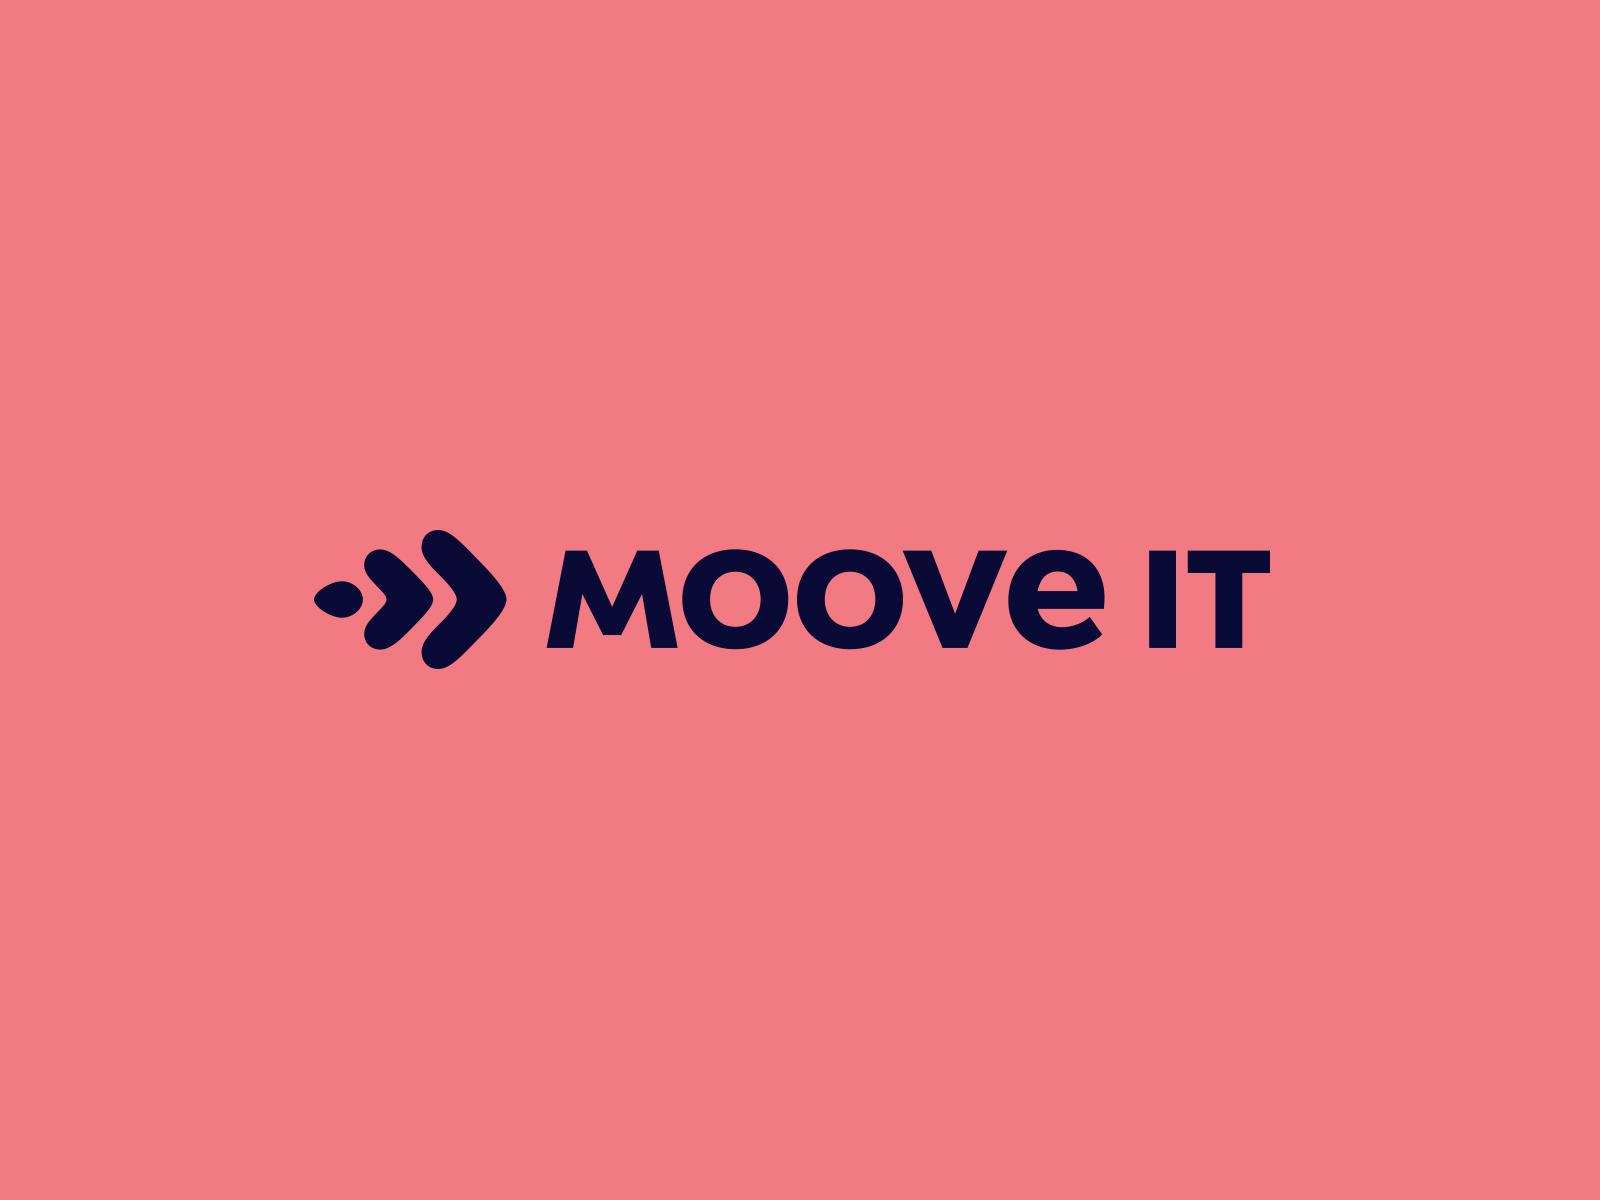 Moove it strategy